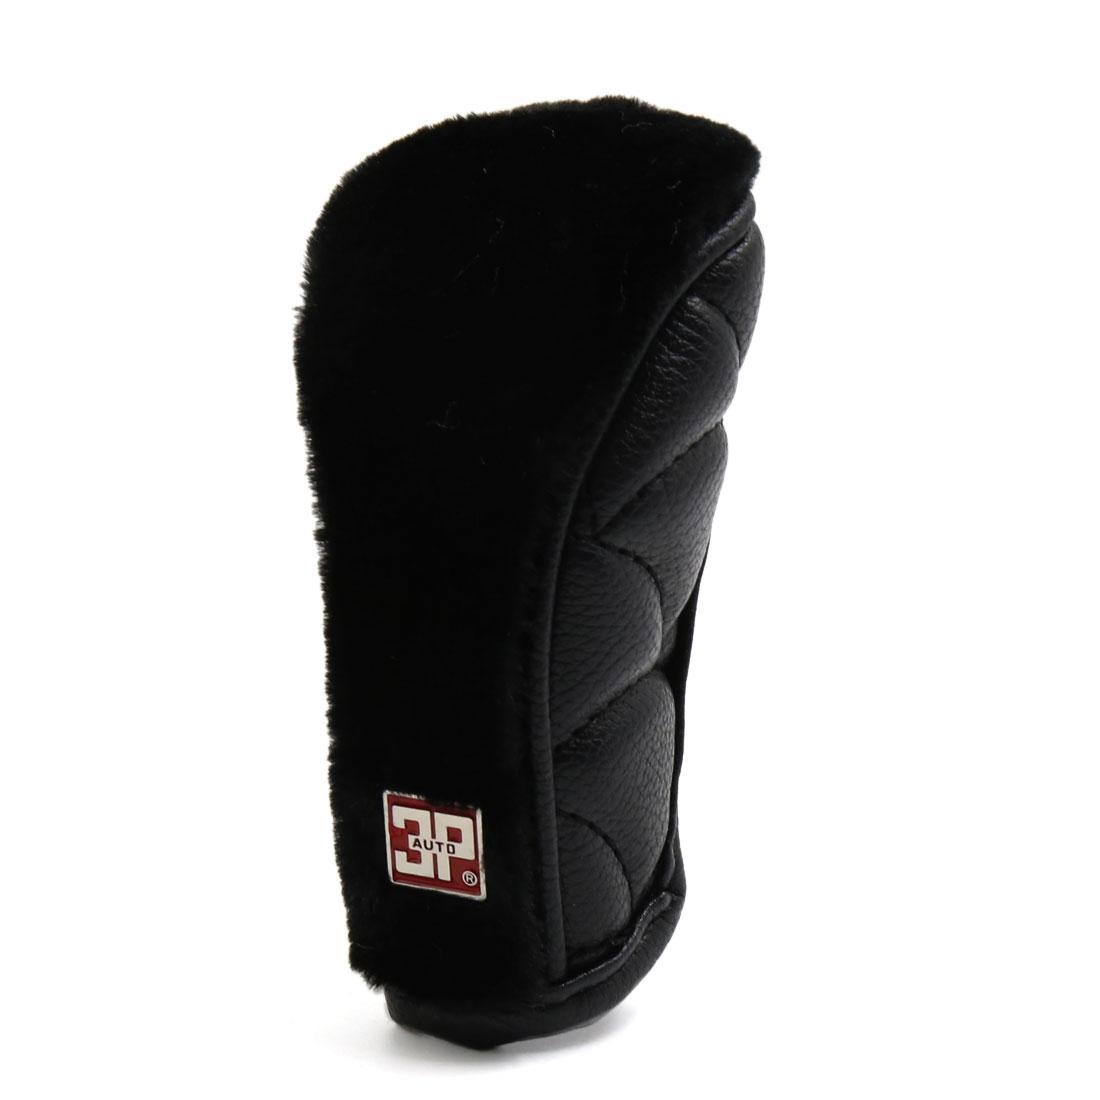 Faux Leather Flannel Zipper Closure Car Gear Shift Lever Knob Cover Black - image 2 of 2